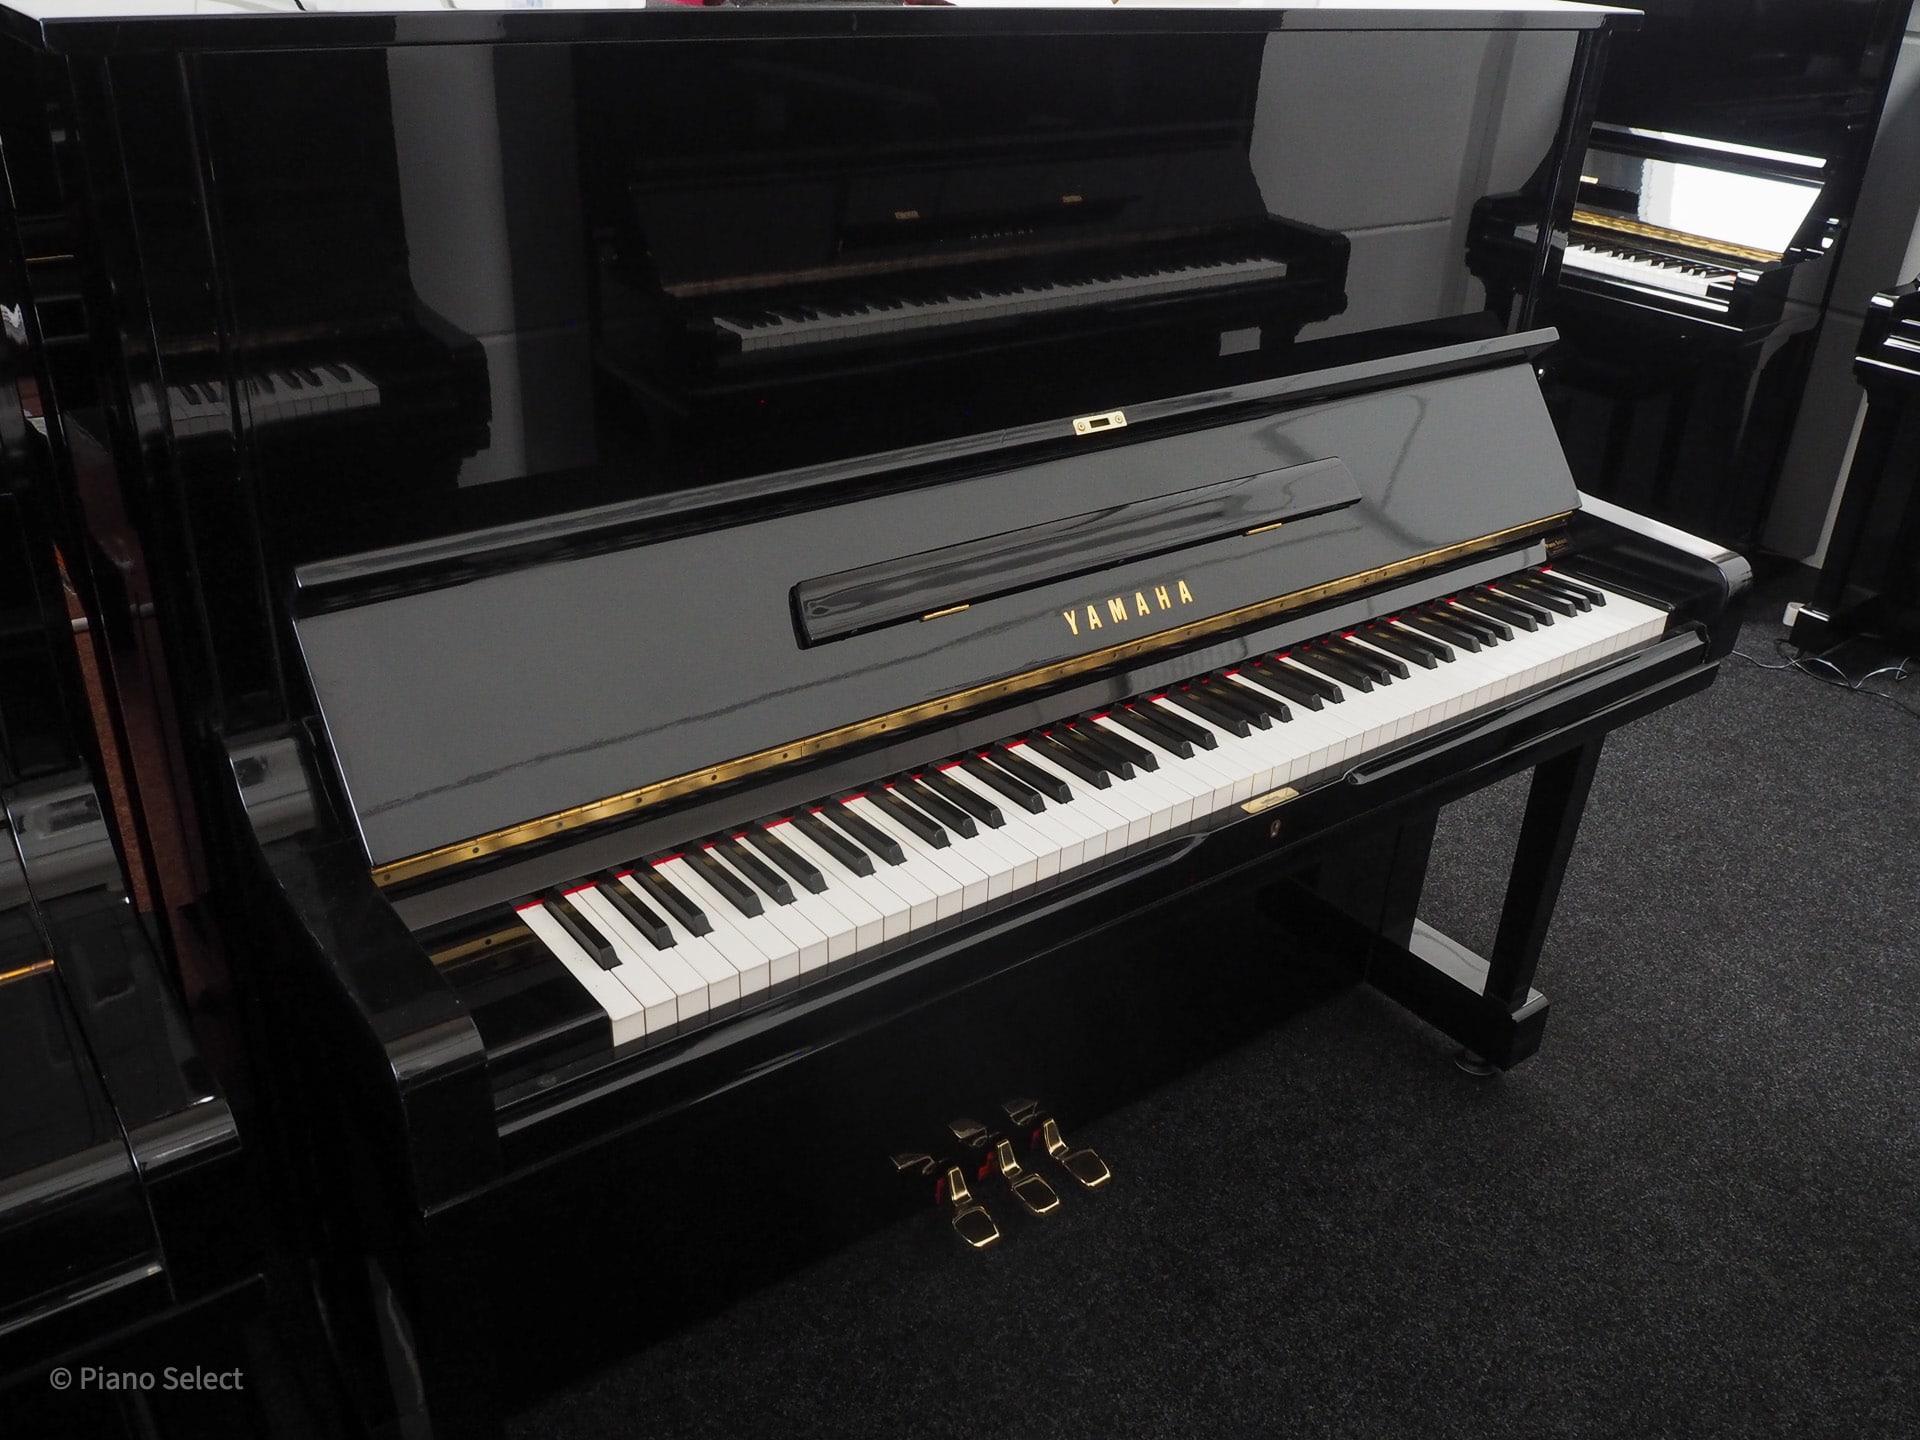 Yamaha U3H piano